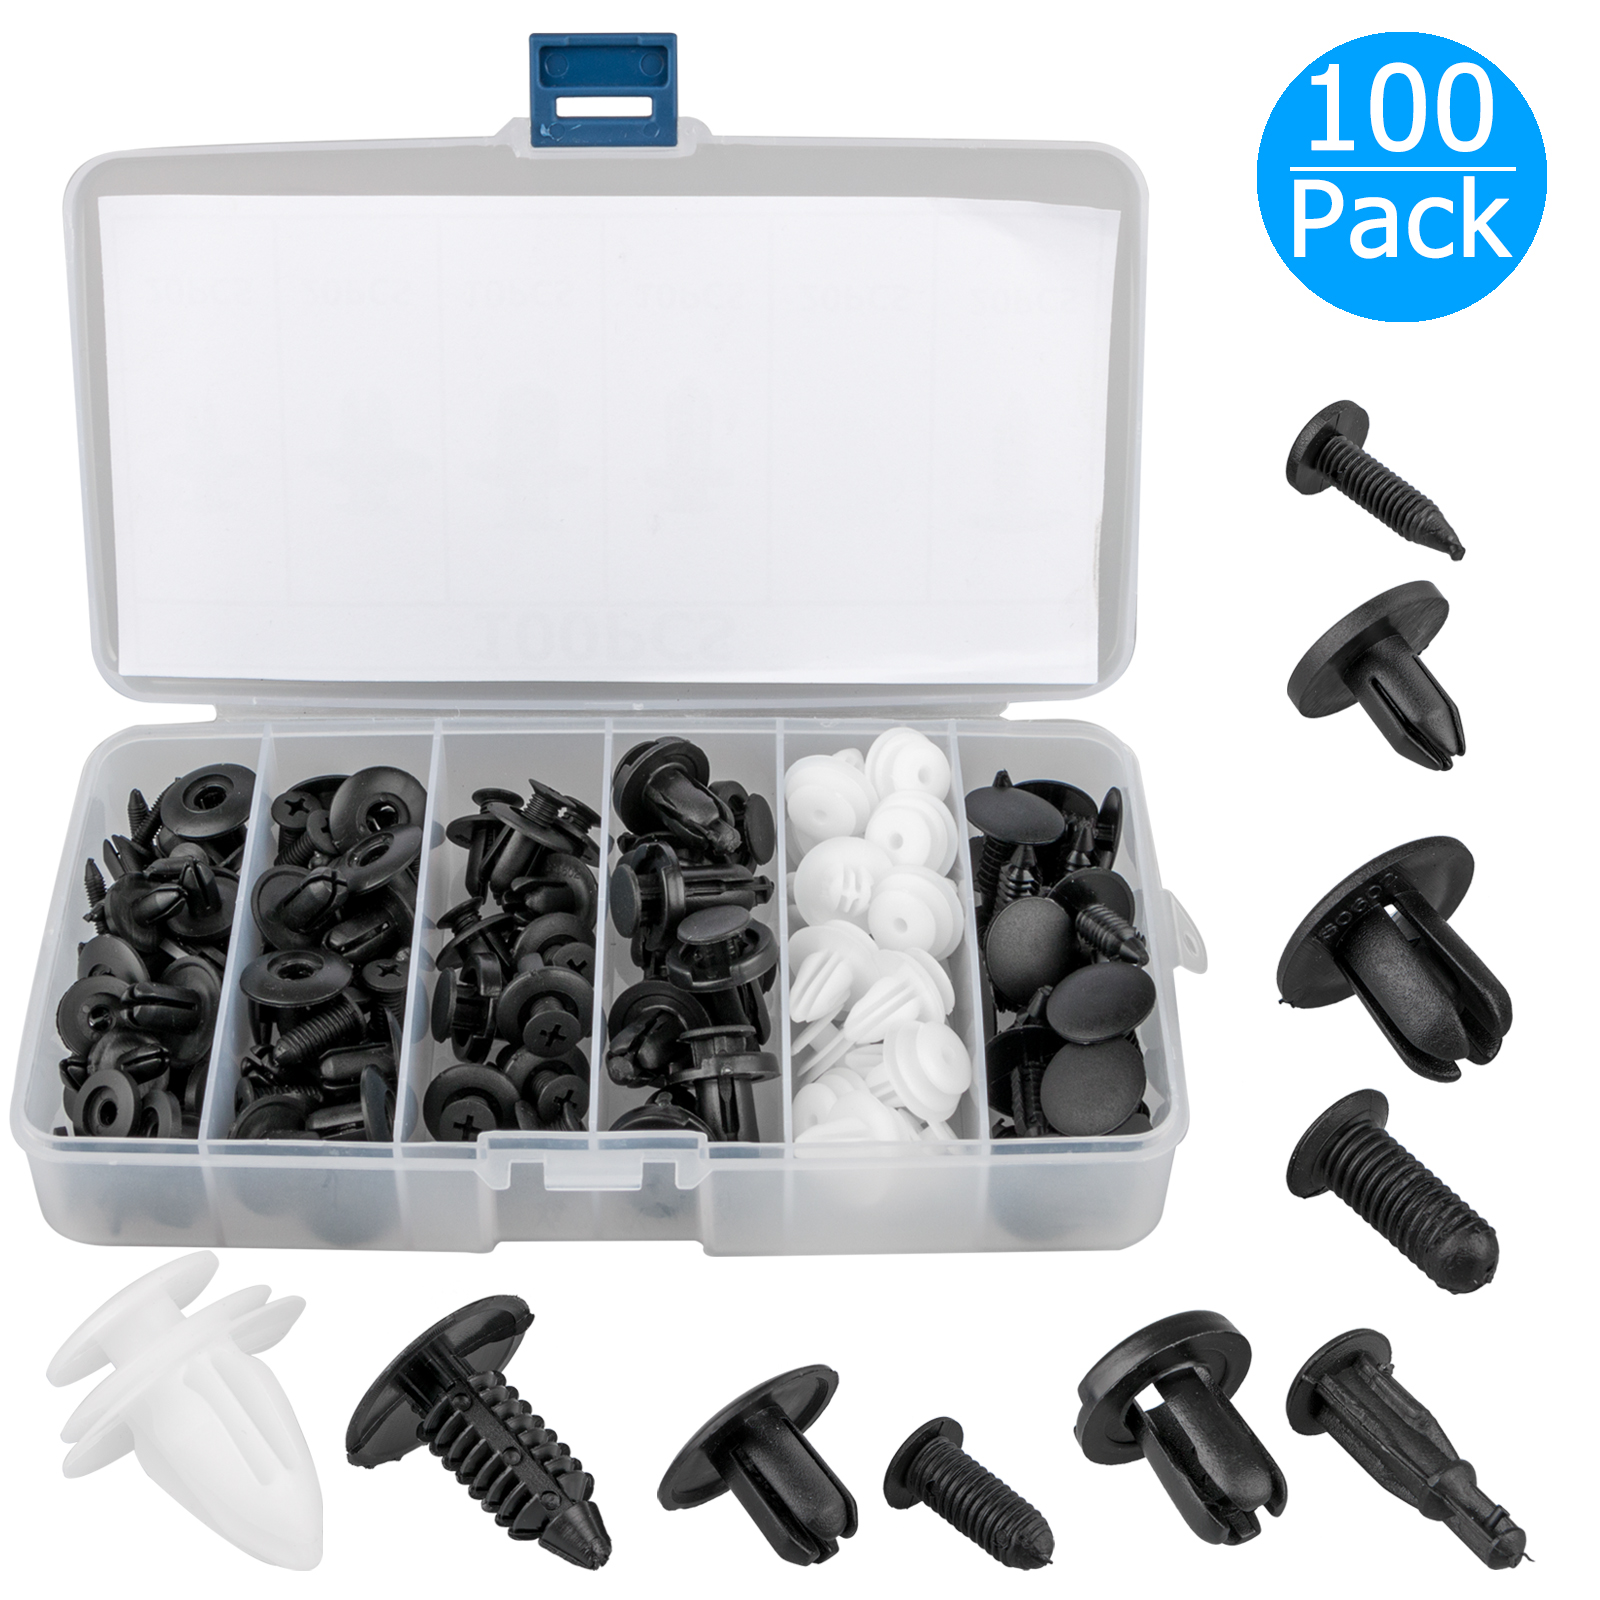 100x Of Box Clip Trim Car Push Pin Rivet Bumper Door Panel Retainer Accessories